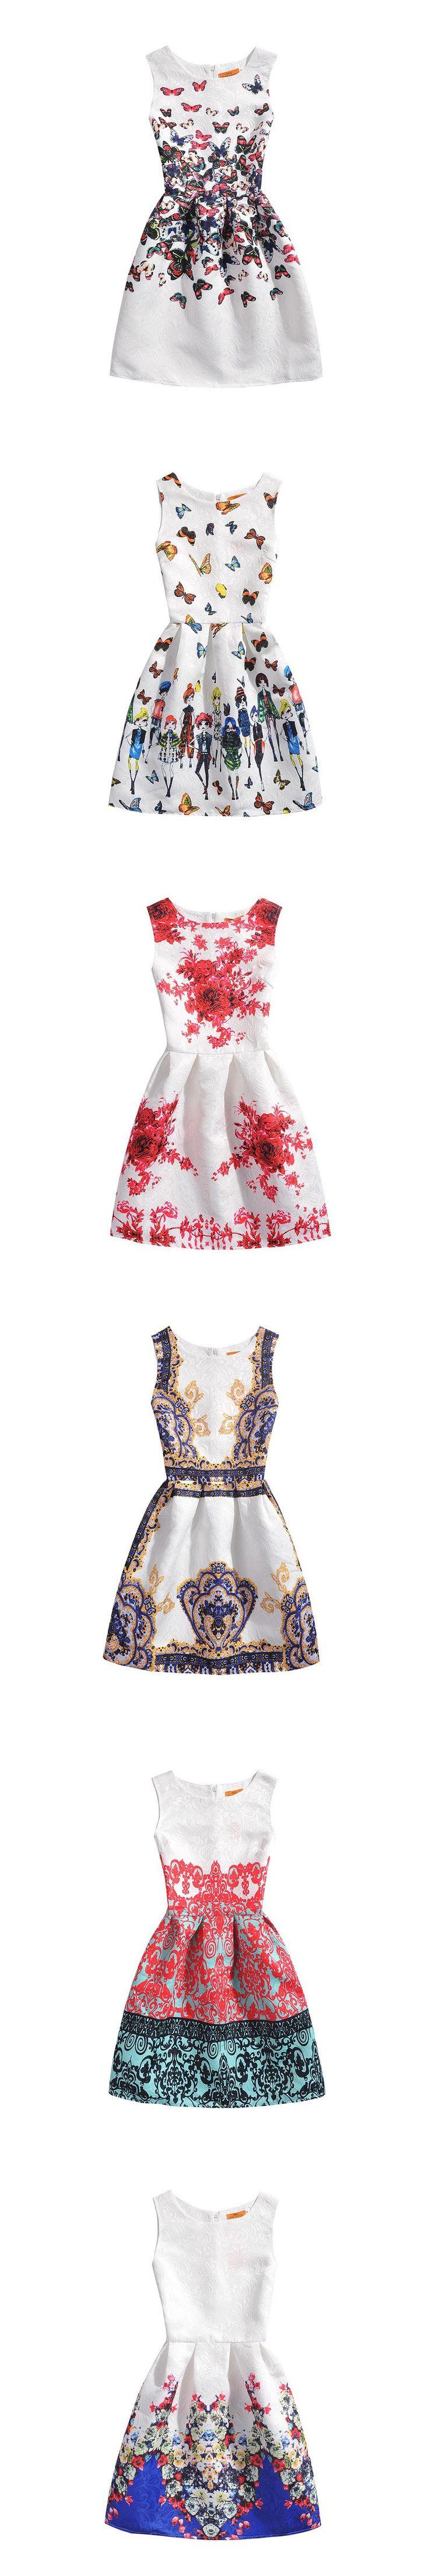 New Teenage Girls Dress Kids Printing Summer Dress Slim Sleeveless Princess Sofia Dress Kids Clothes For Girls 6 7 8 9 Year Olds $13.99